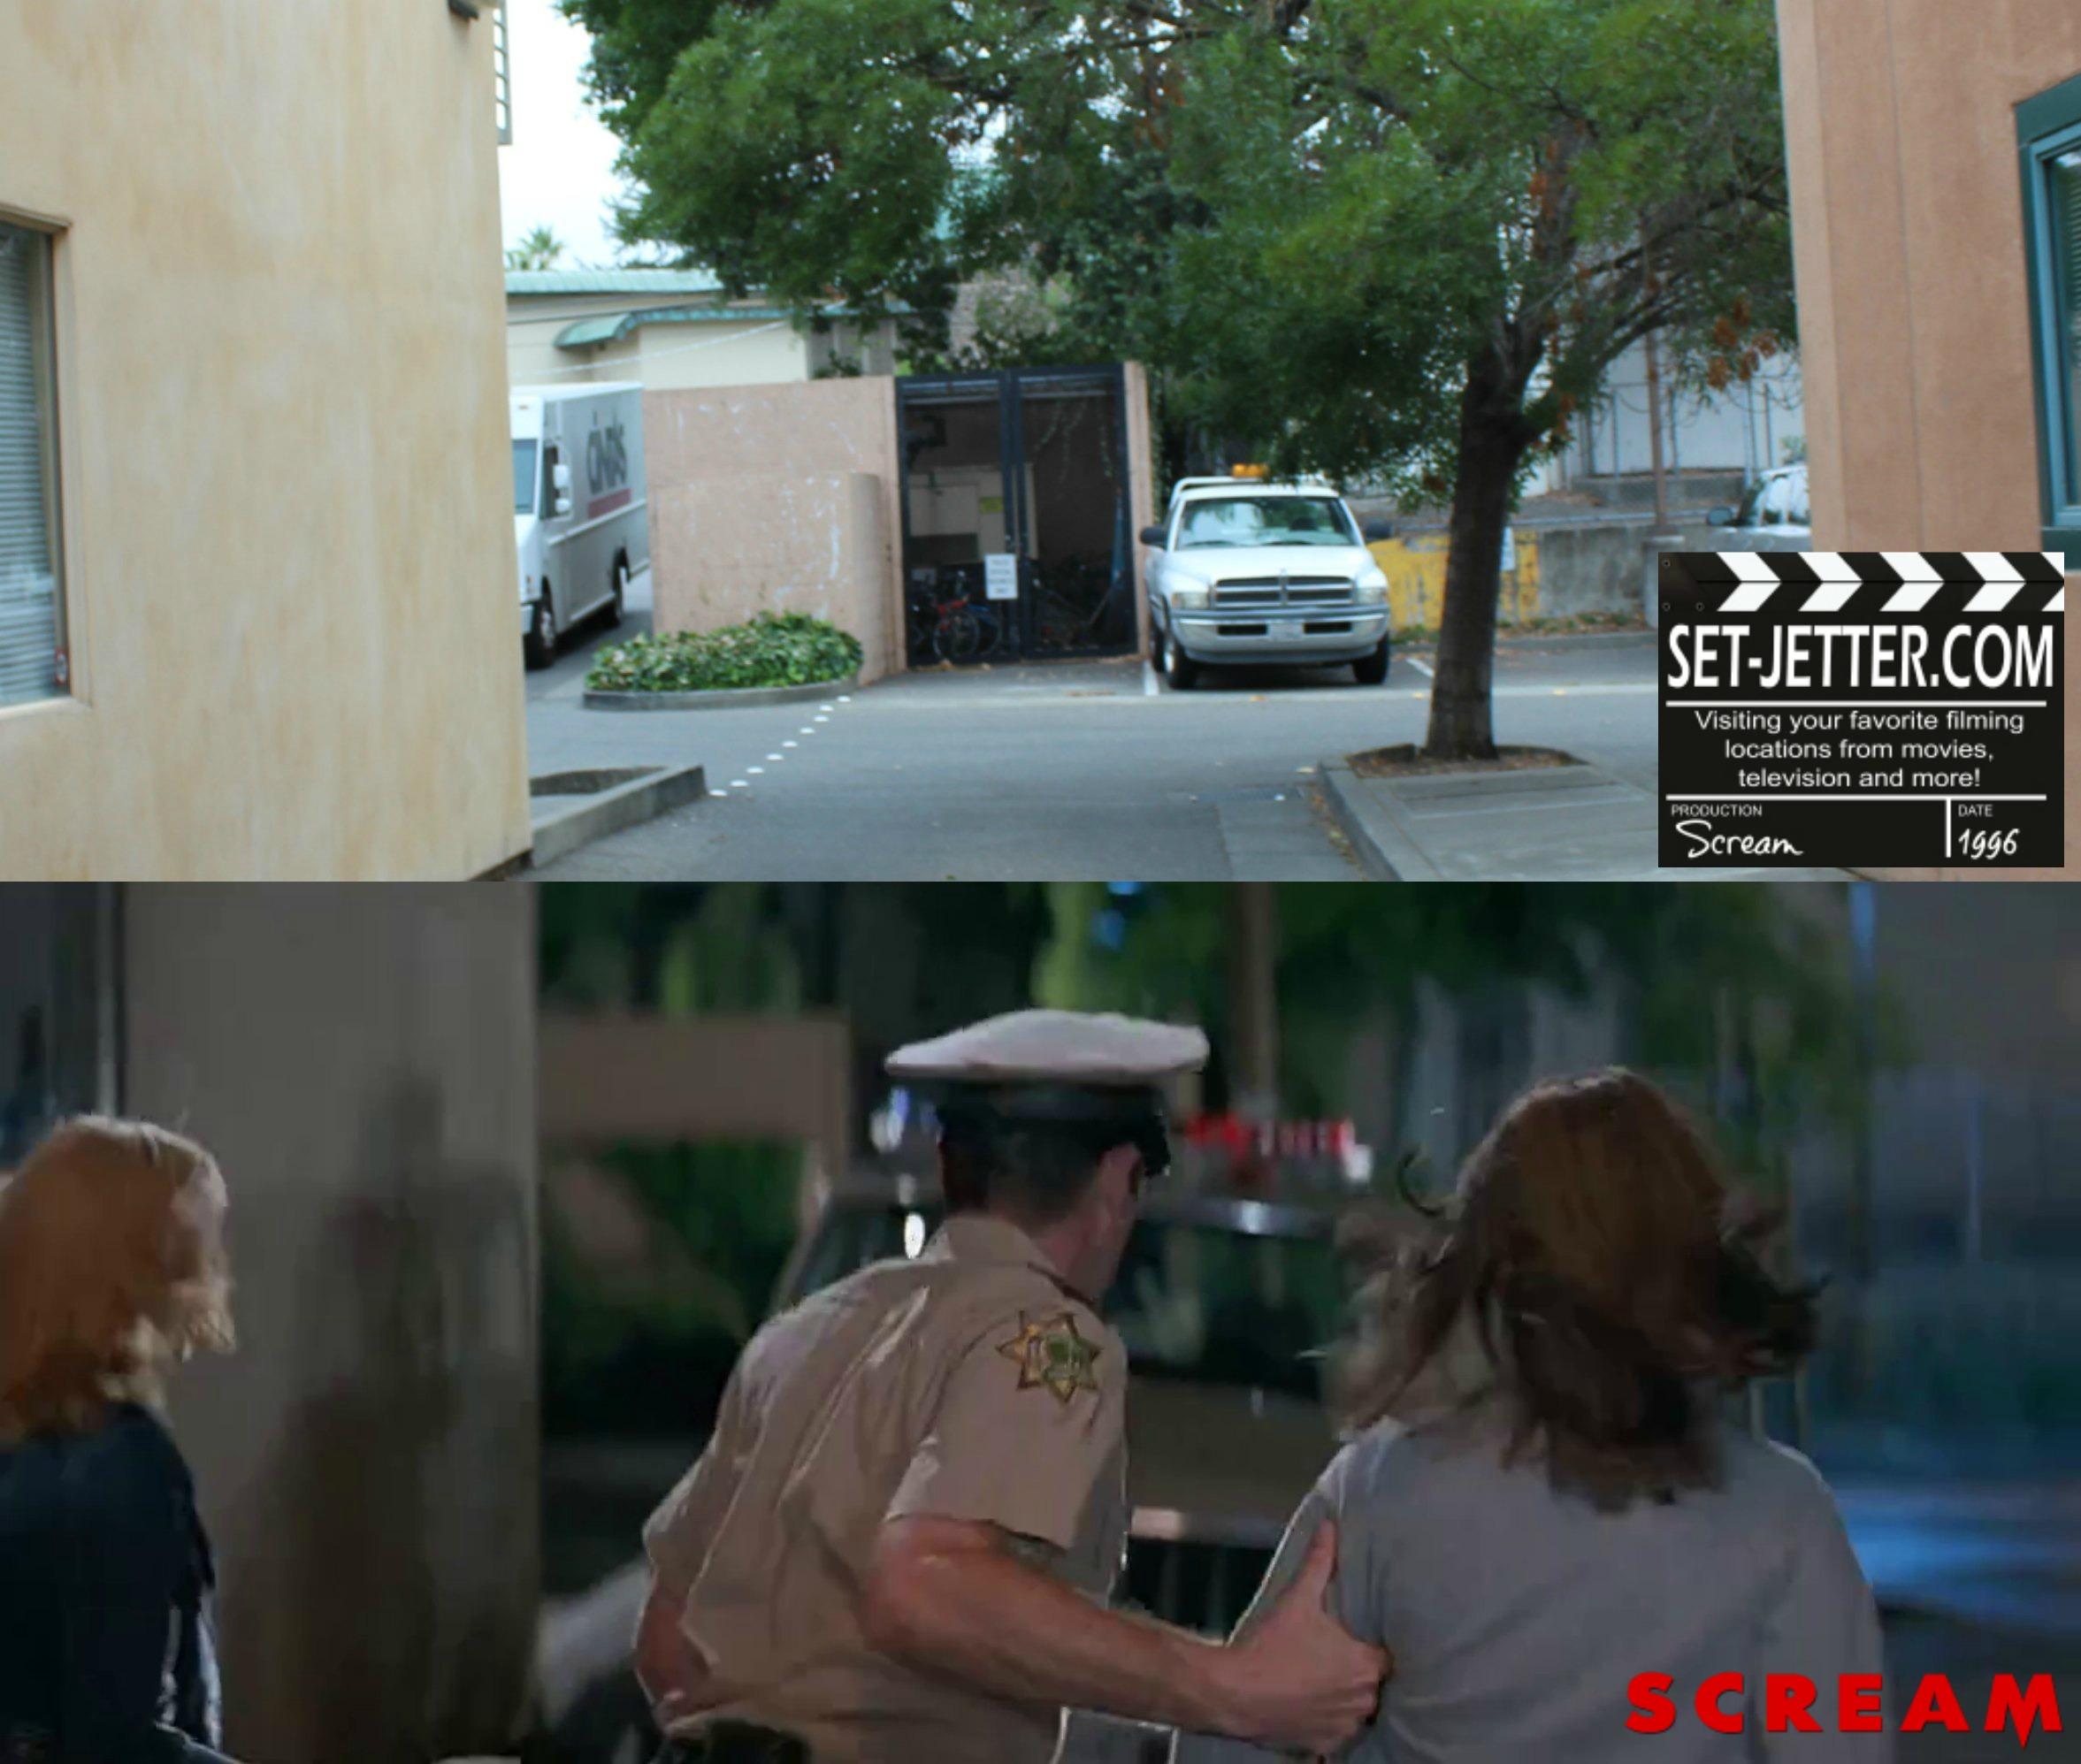 Scream comparison 66.jpg